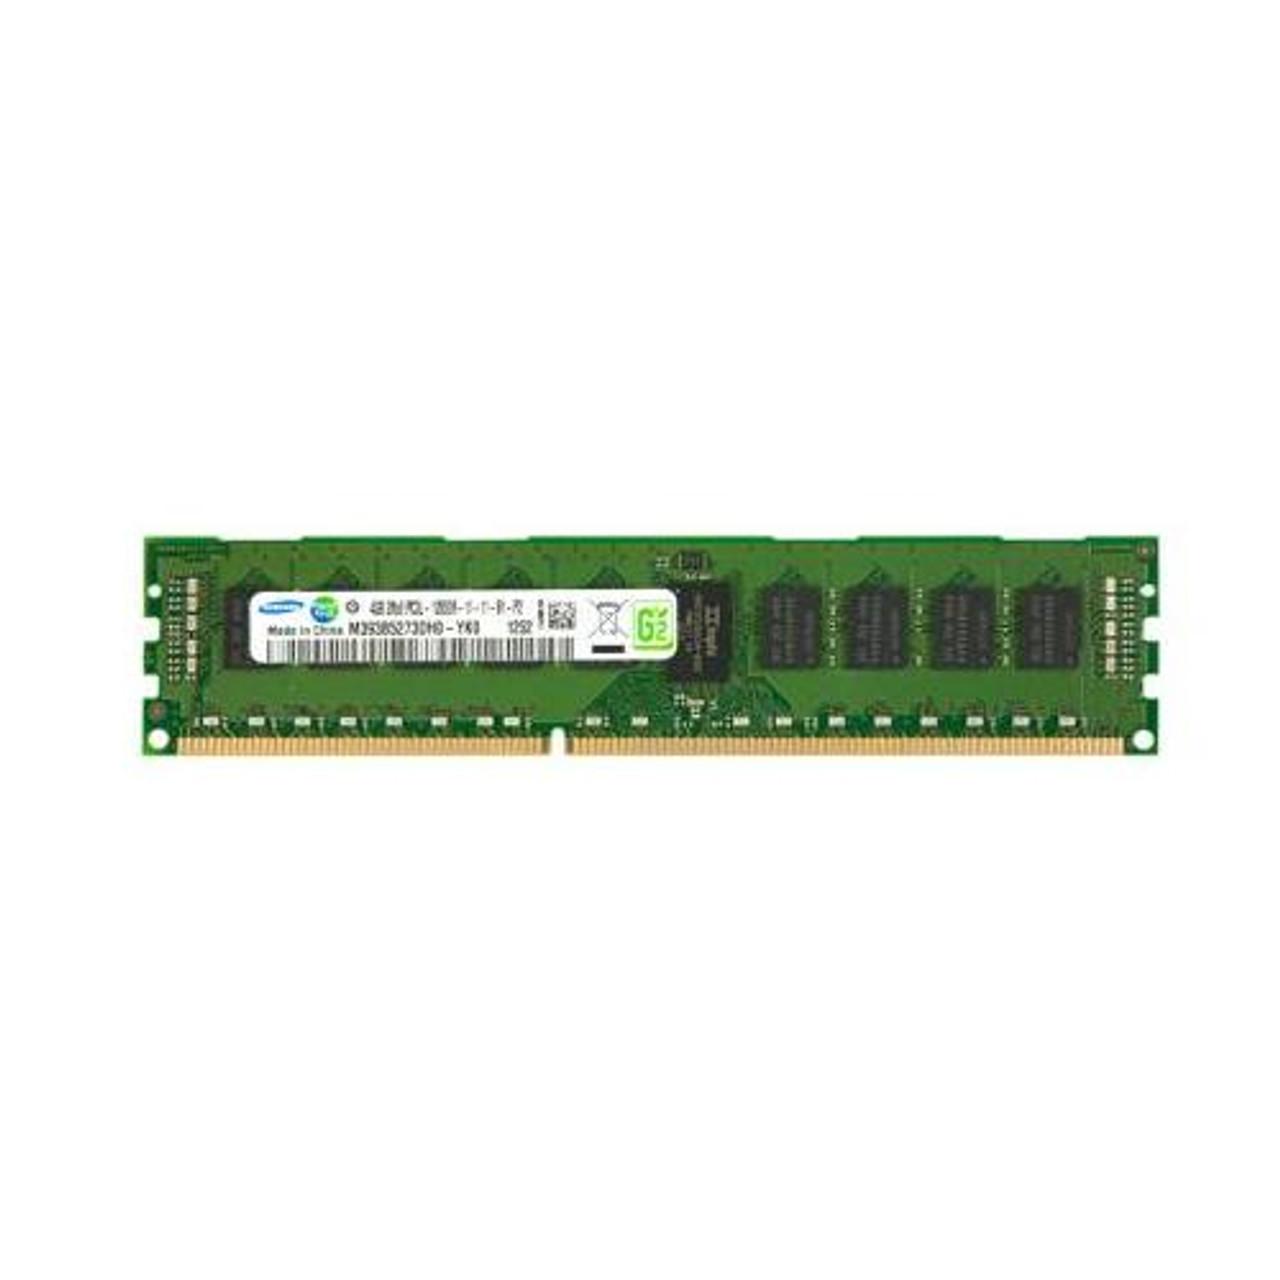 8GB DDR3 PC3L-10600R 2Rx8 ECC Reg Server Memory RAM Samsung M393B1G73BH0-YH9